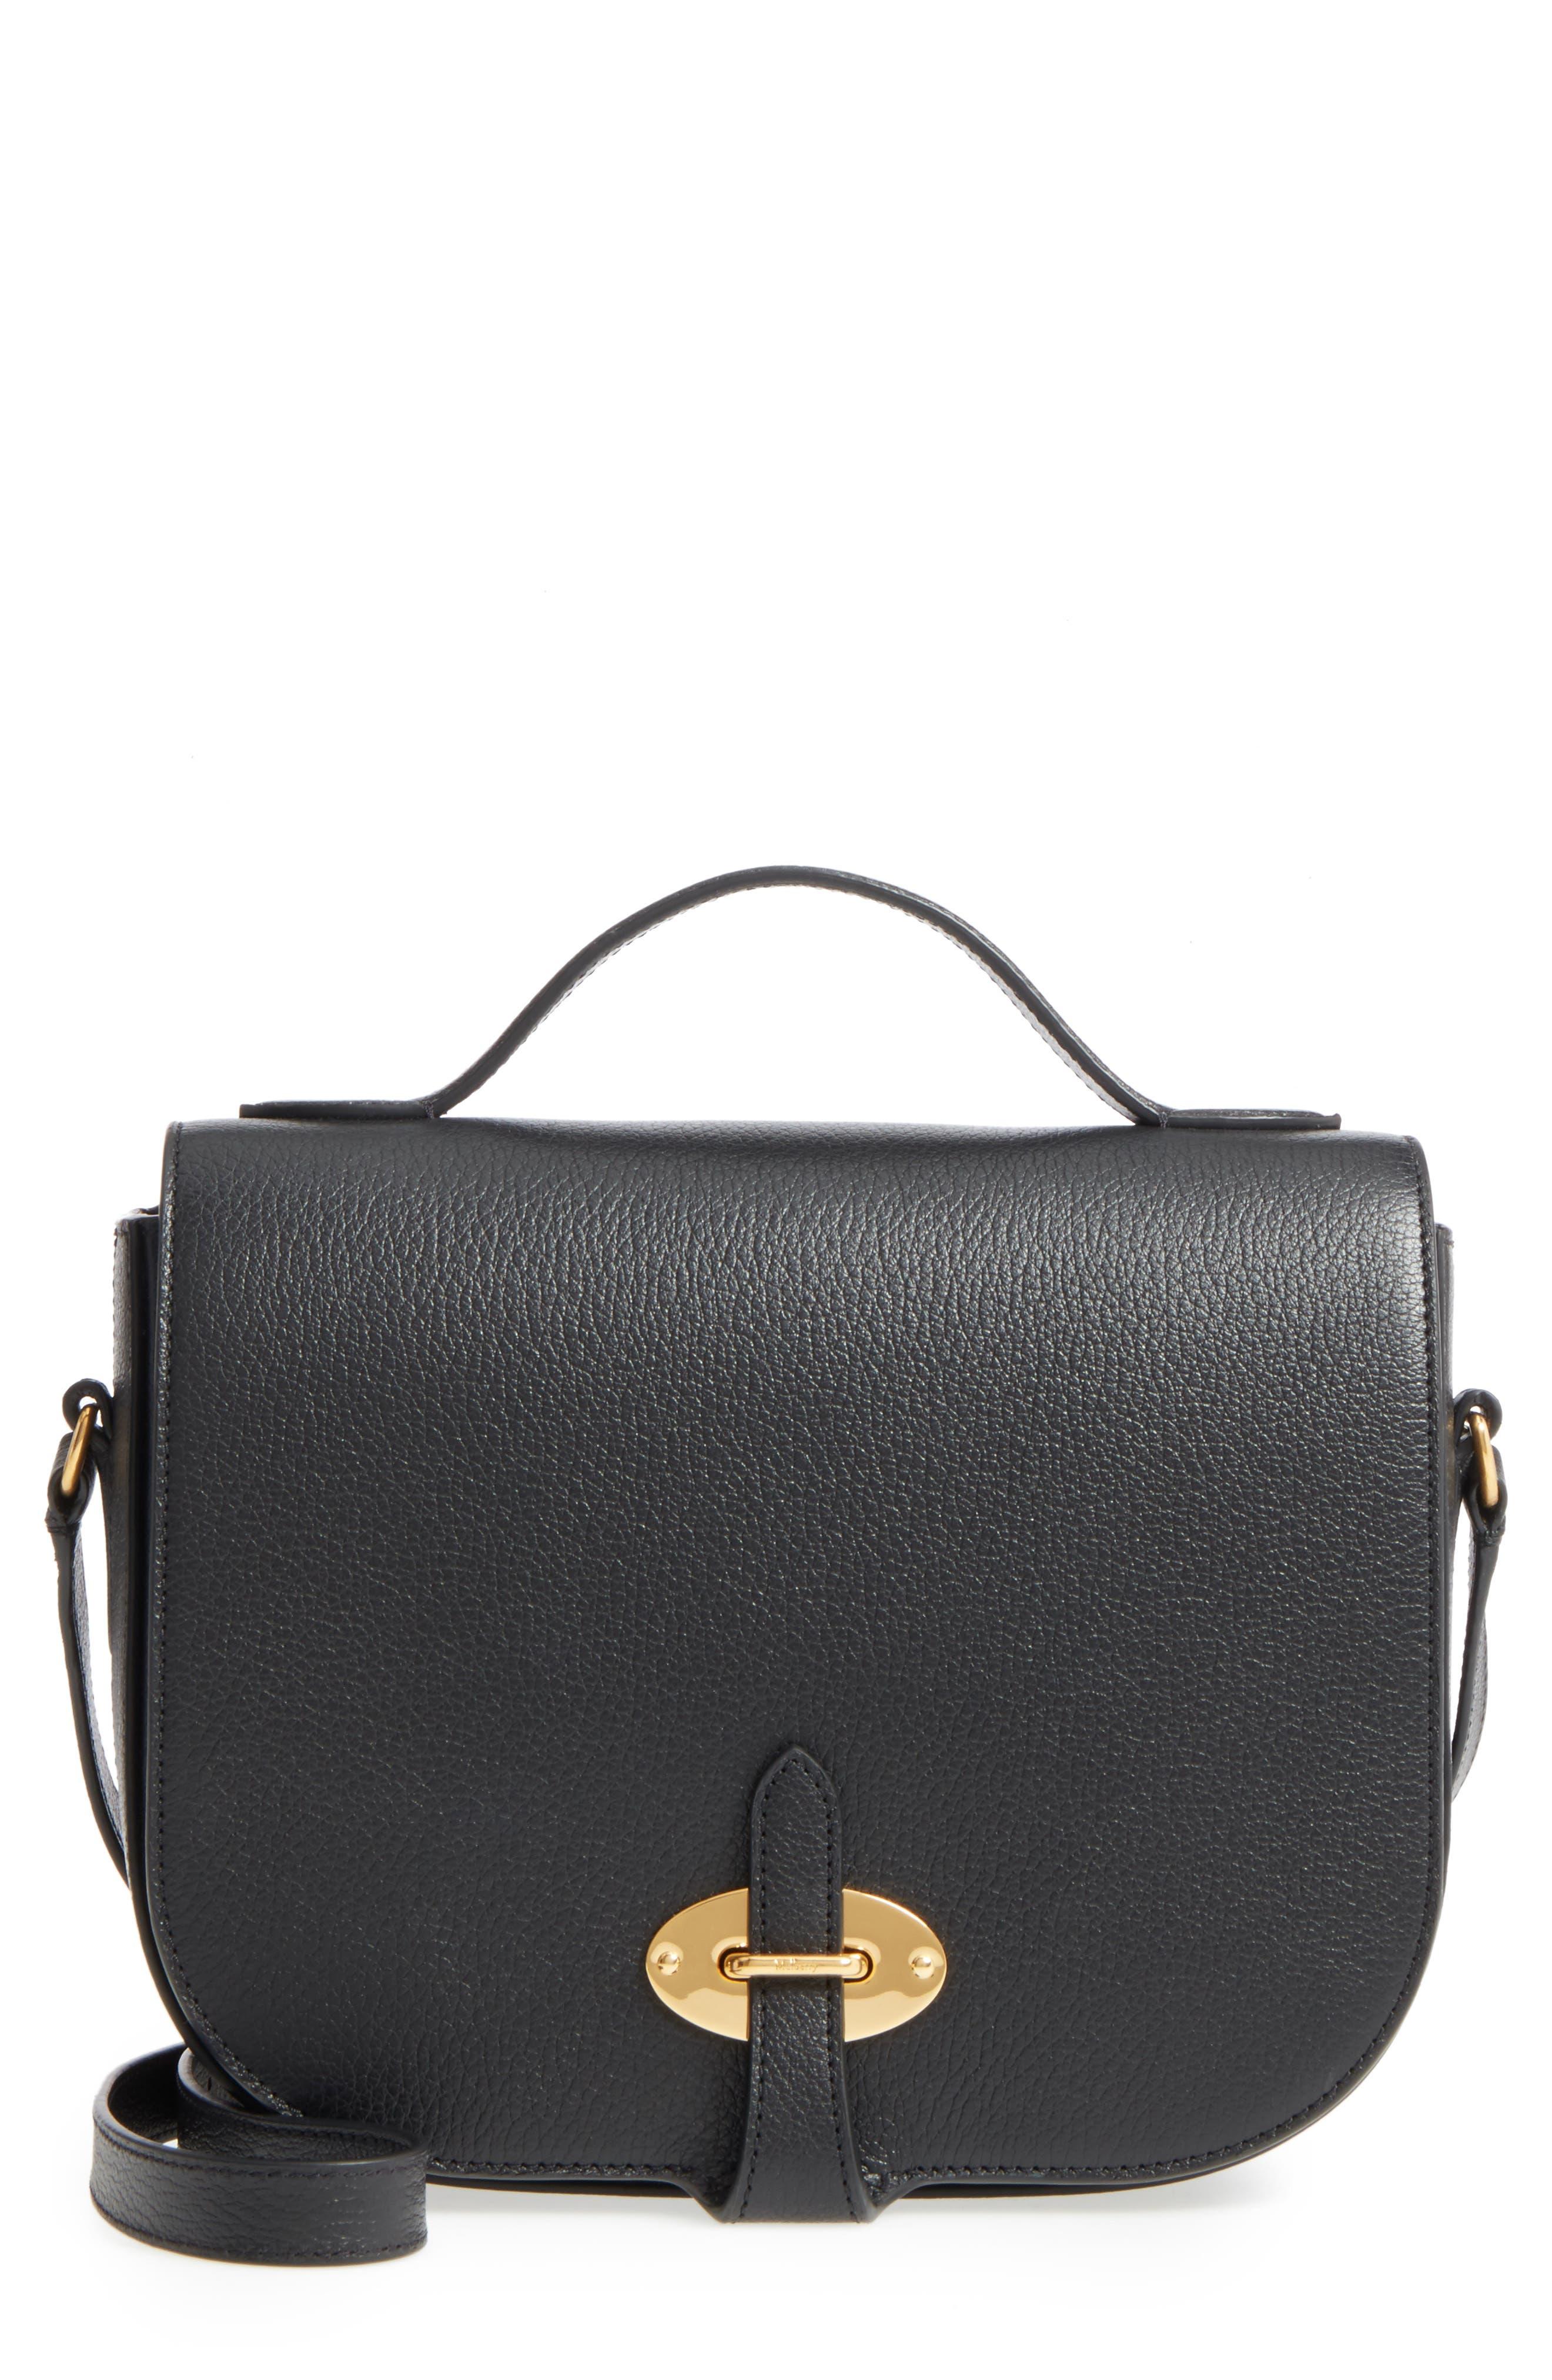 Tenby Calfskin Leather Crossbody Bag,                             Main thumbnail 1, color,                             001